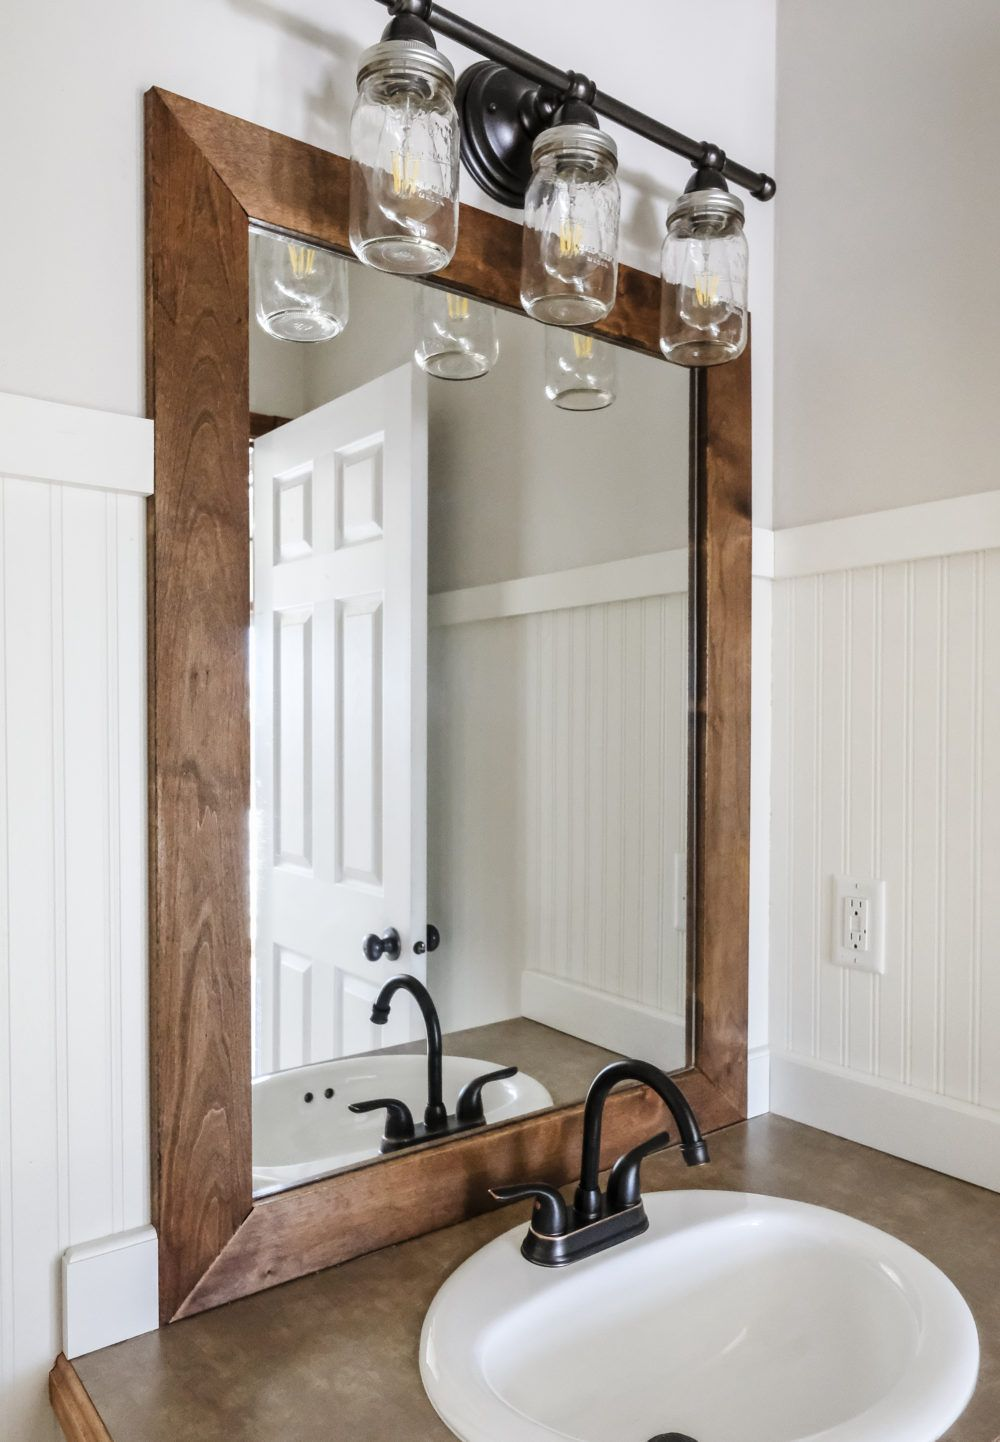 How To Add A Diy Wood Frame To A Bathroom Mirror Bathroom Mirror Design Wood Framed Bathroom Mirrors Bathroom Mirrors Diy